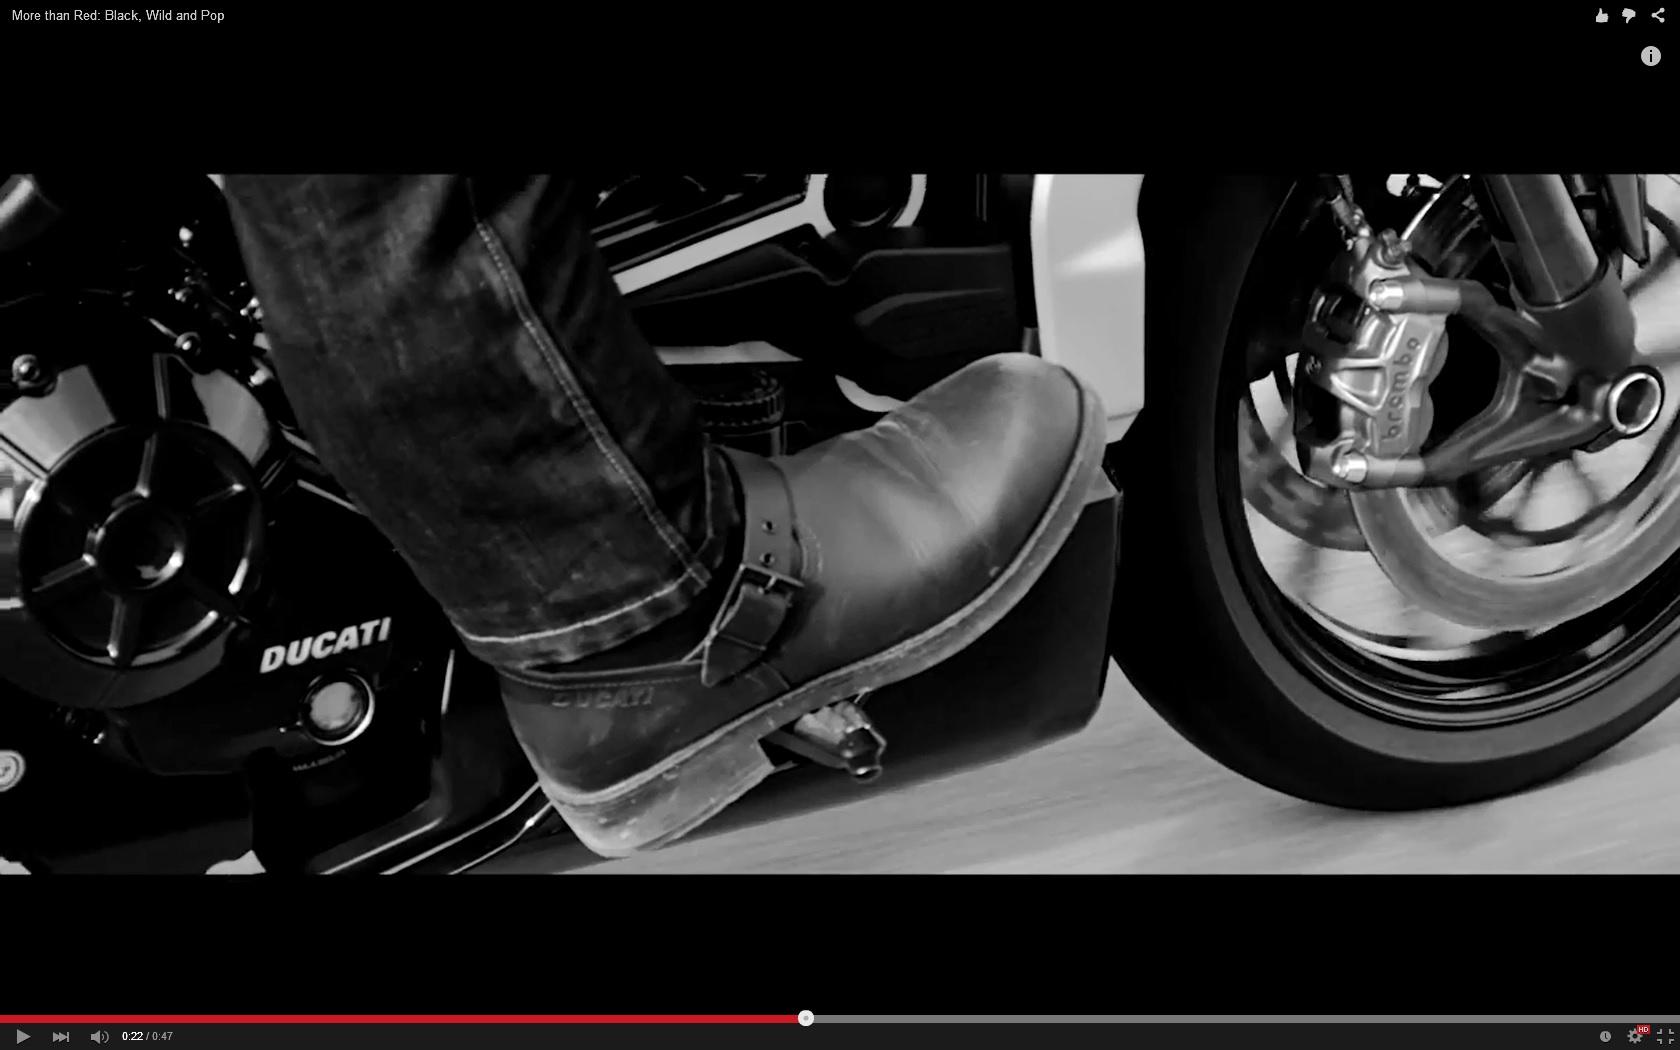 First glimpse of new Scrambler in latest Ducati teaser